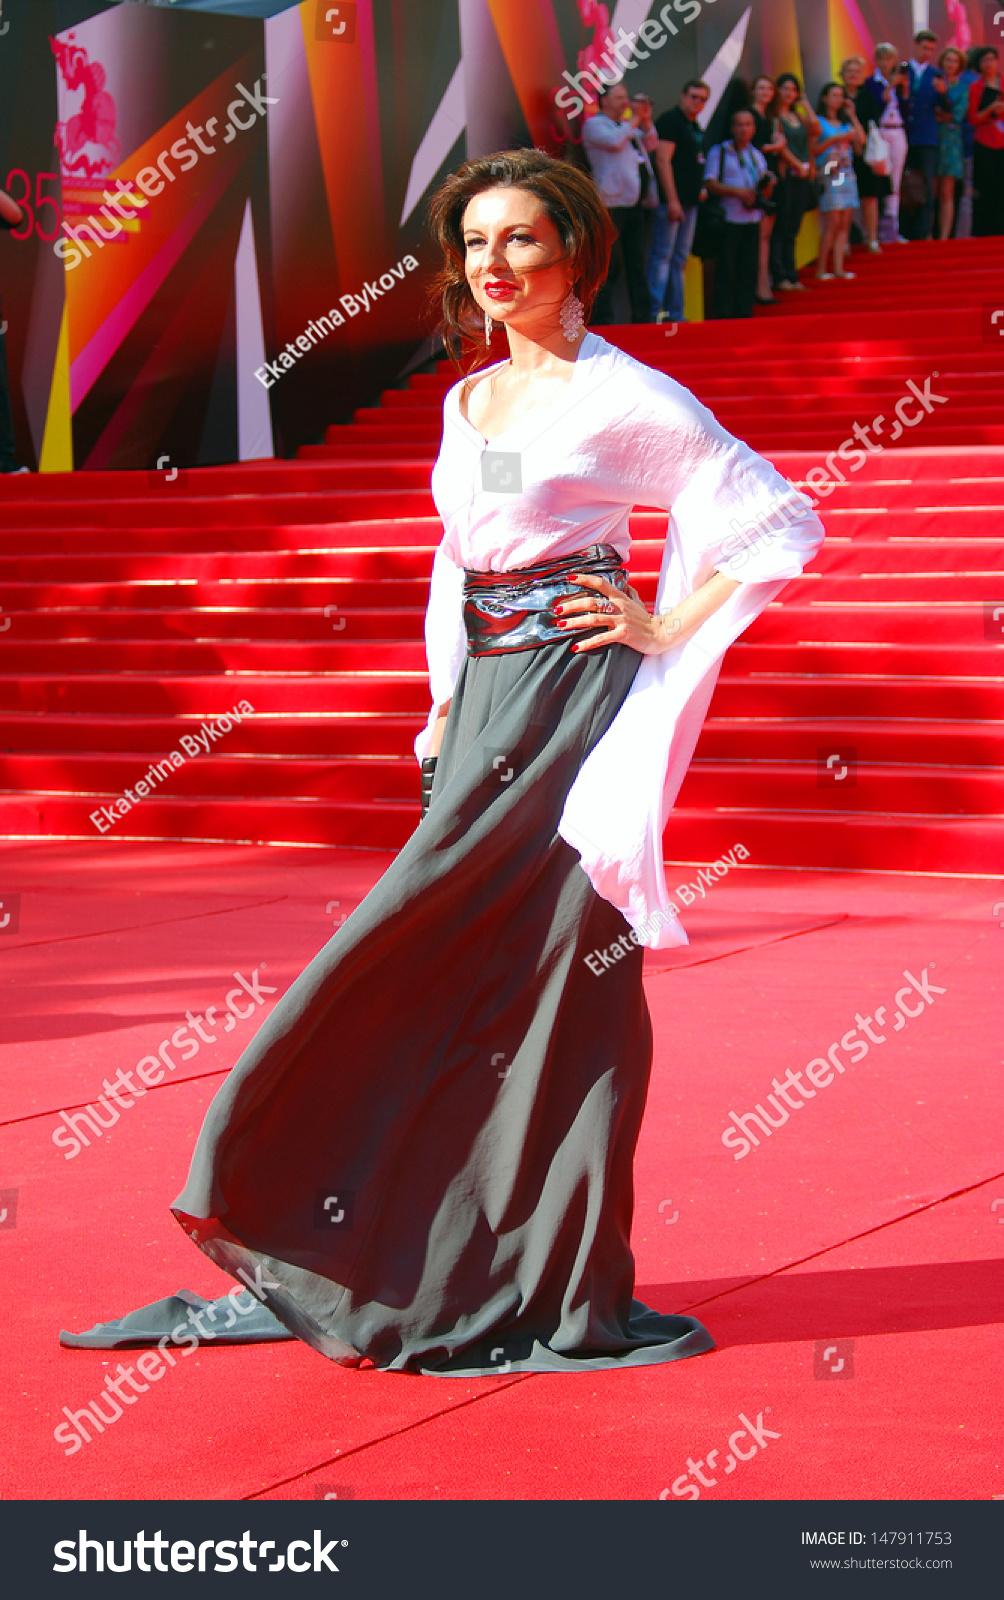 Alisa Khazanova moscow russia june 20 former ballerina stock photo (edit now